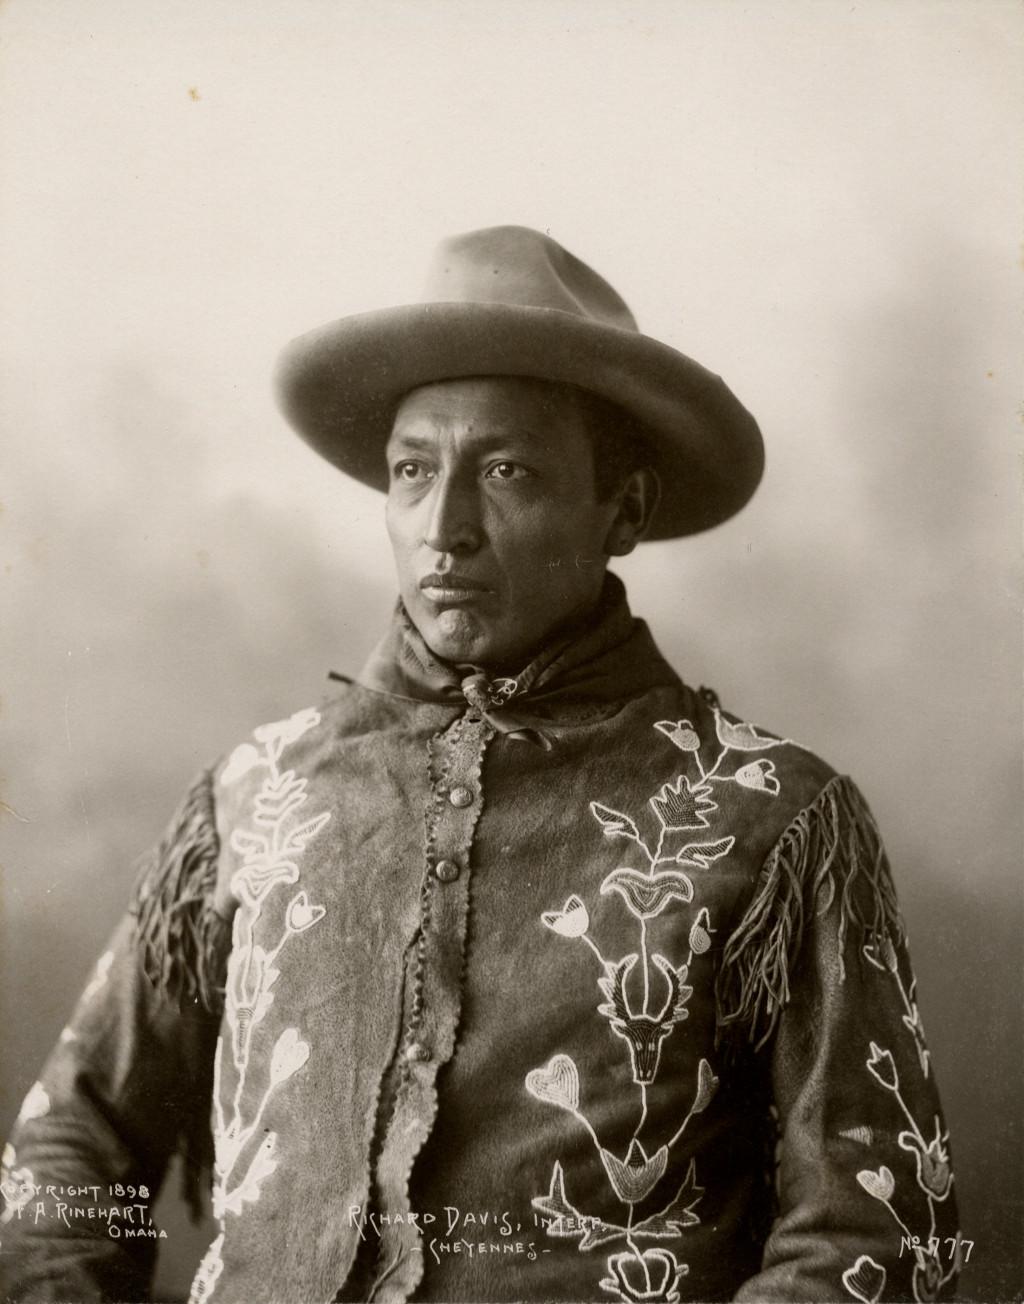 Frank Rinehart - Native American - Richard Davis – Cheyenne